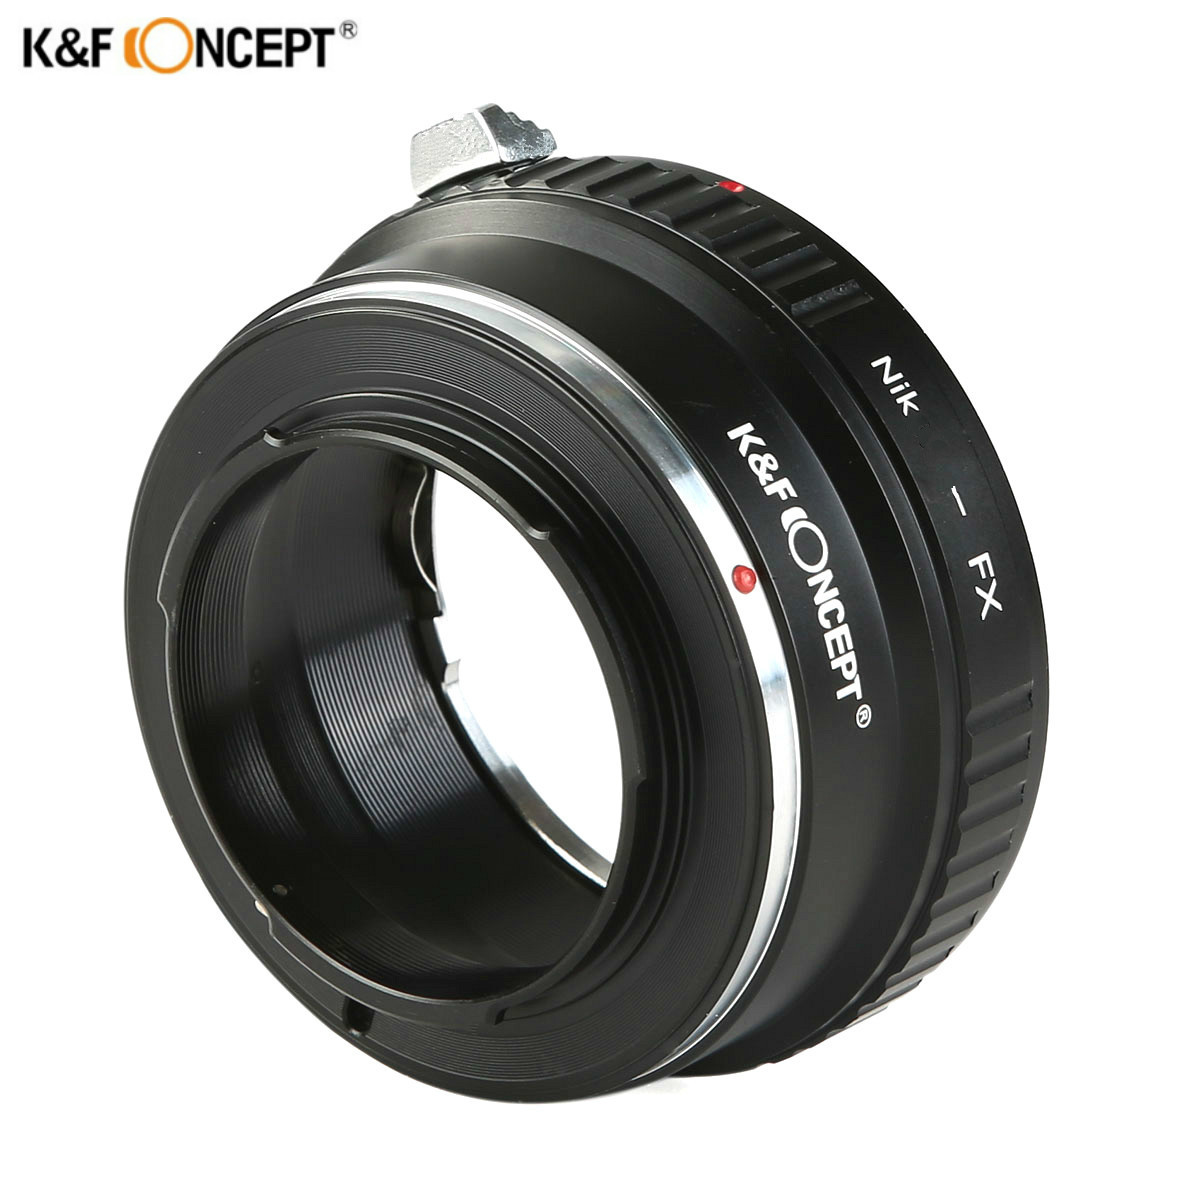 K&F CONCEPT Lens Adapter Ring for Nikon Auto AI AIs AF Lens to Fujifilm Fuji FX Mount X-Pro1 X-E1 Camera